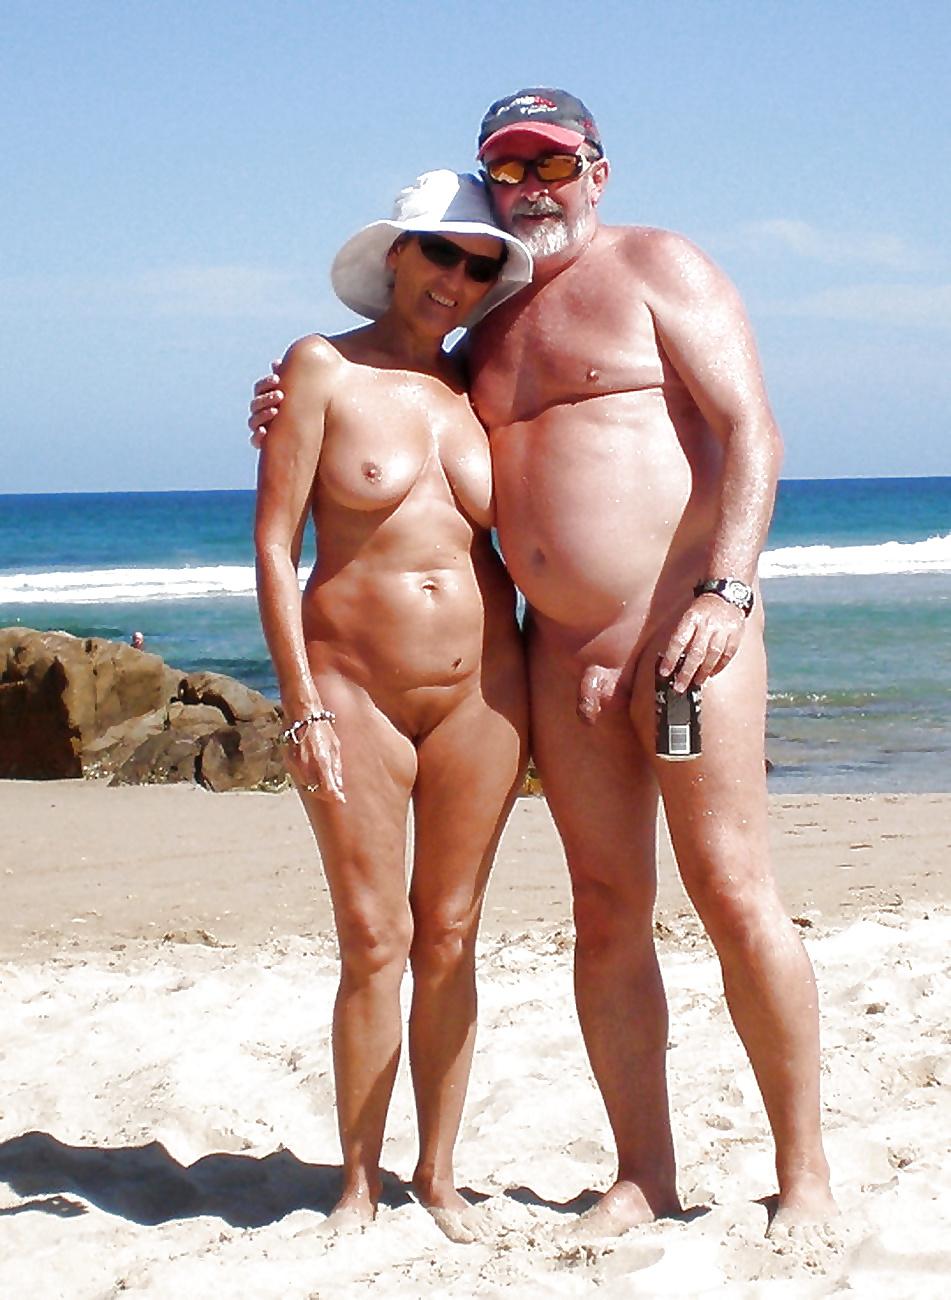 Tropical couples pics, dental girl you tube videos